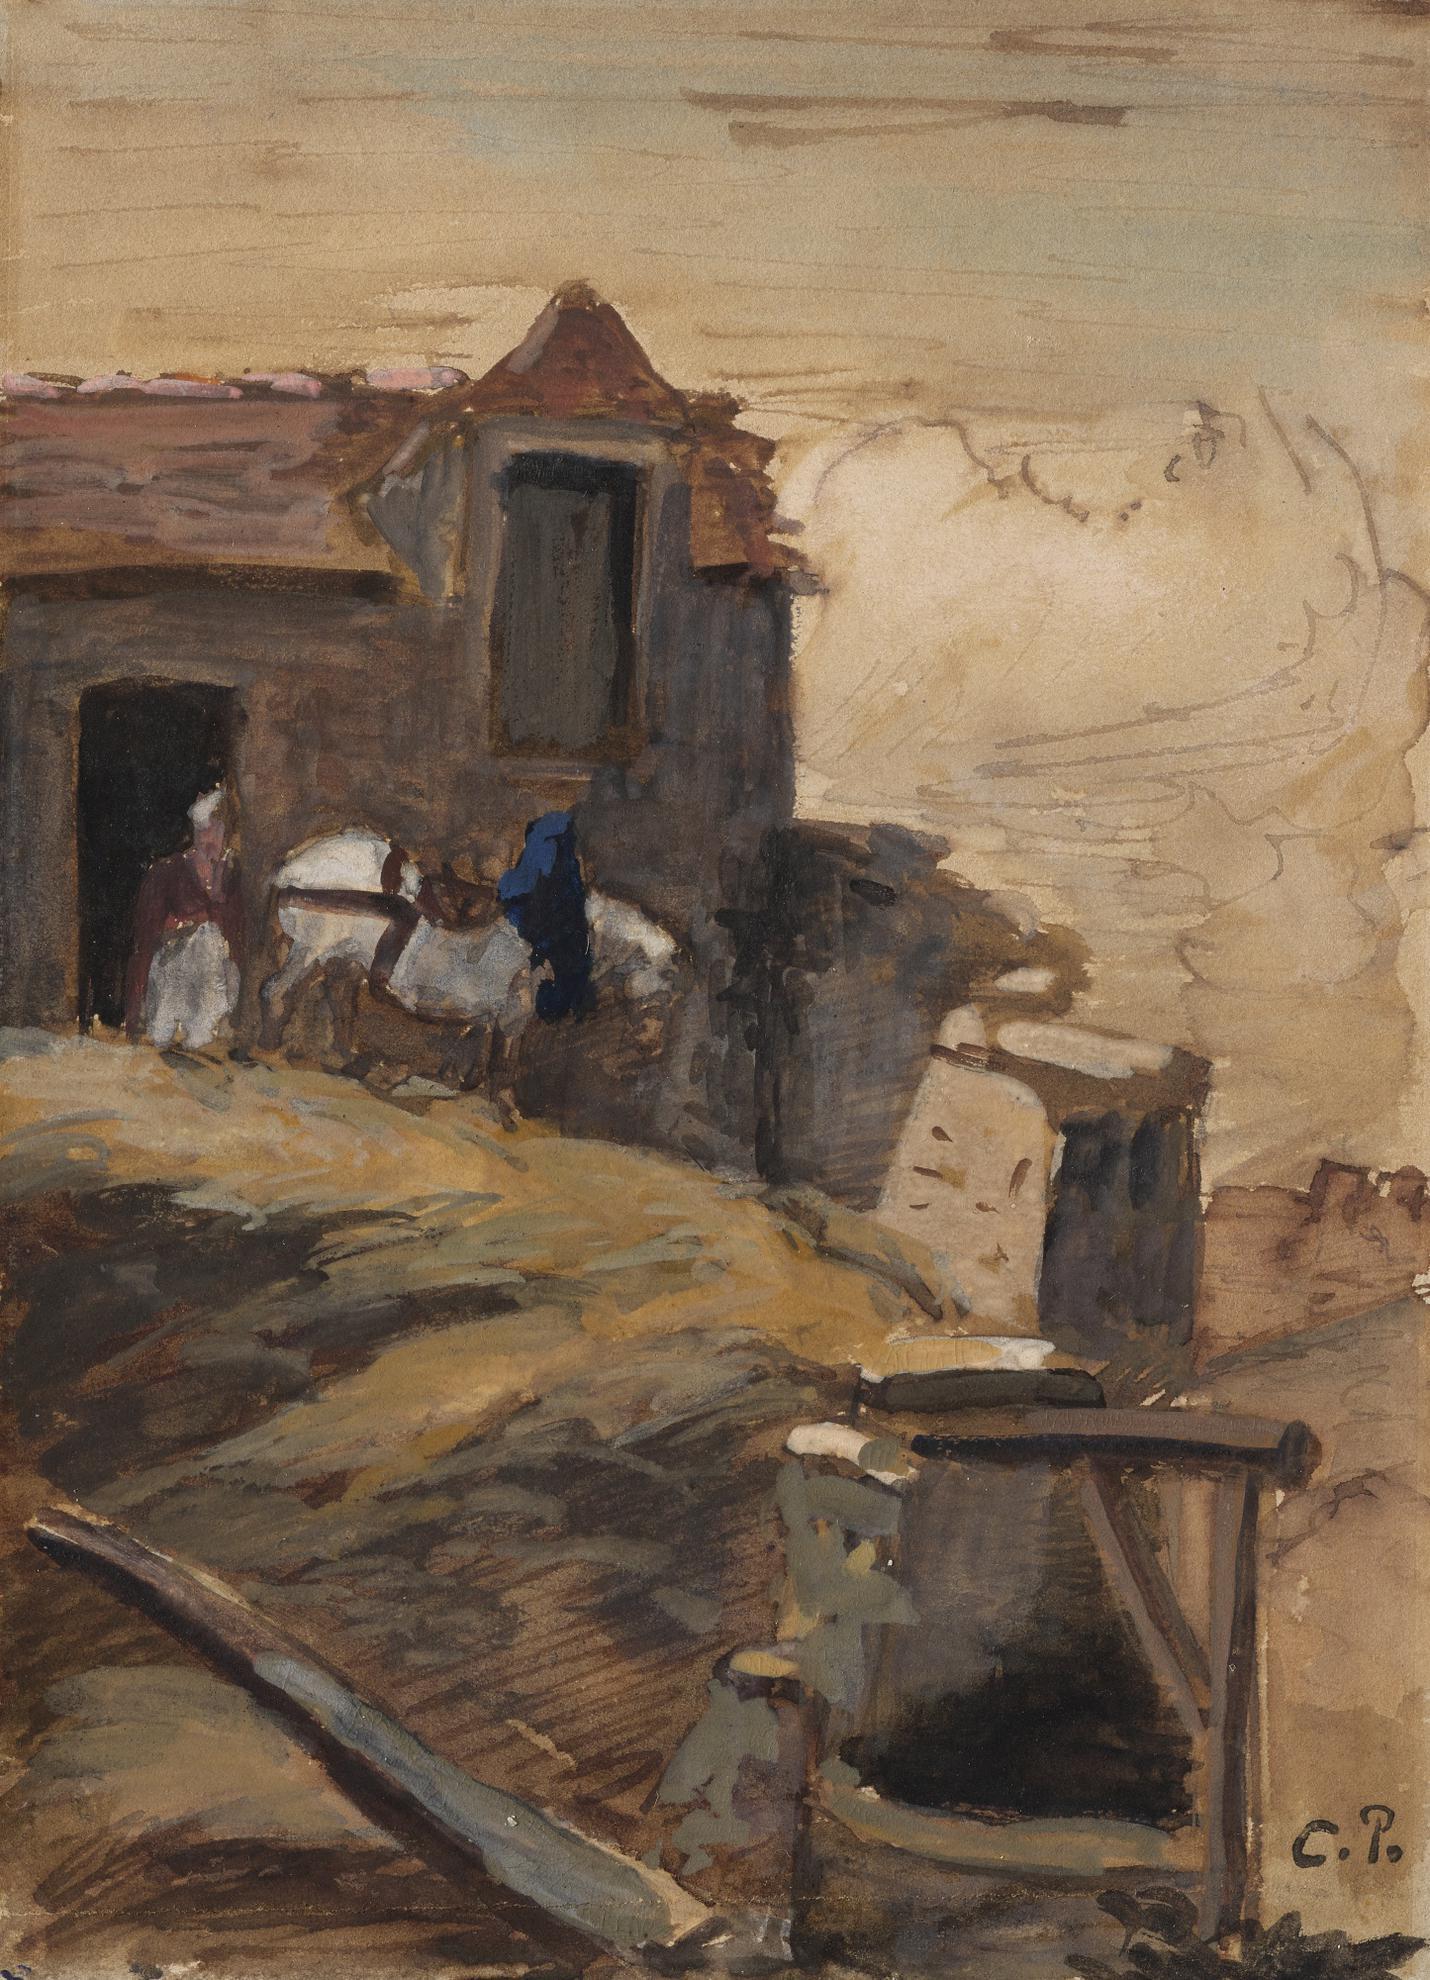 Camille Pissarro-Cheval Blanc Devant Une Ferme-1864